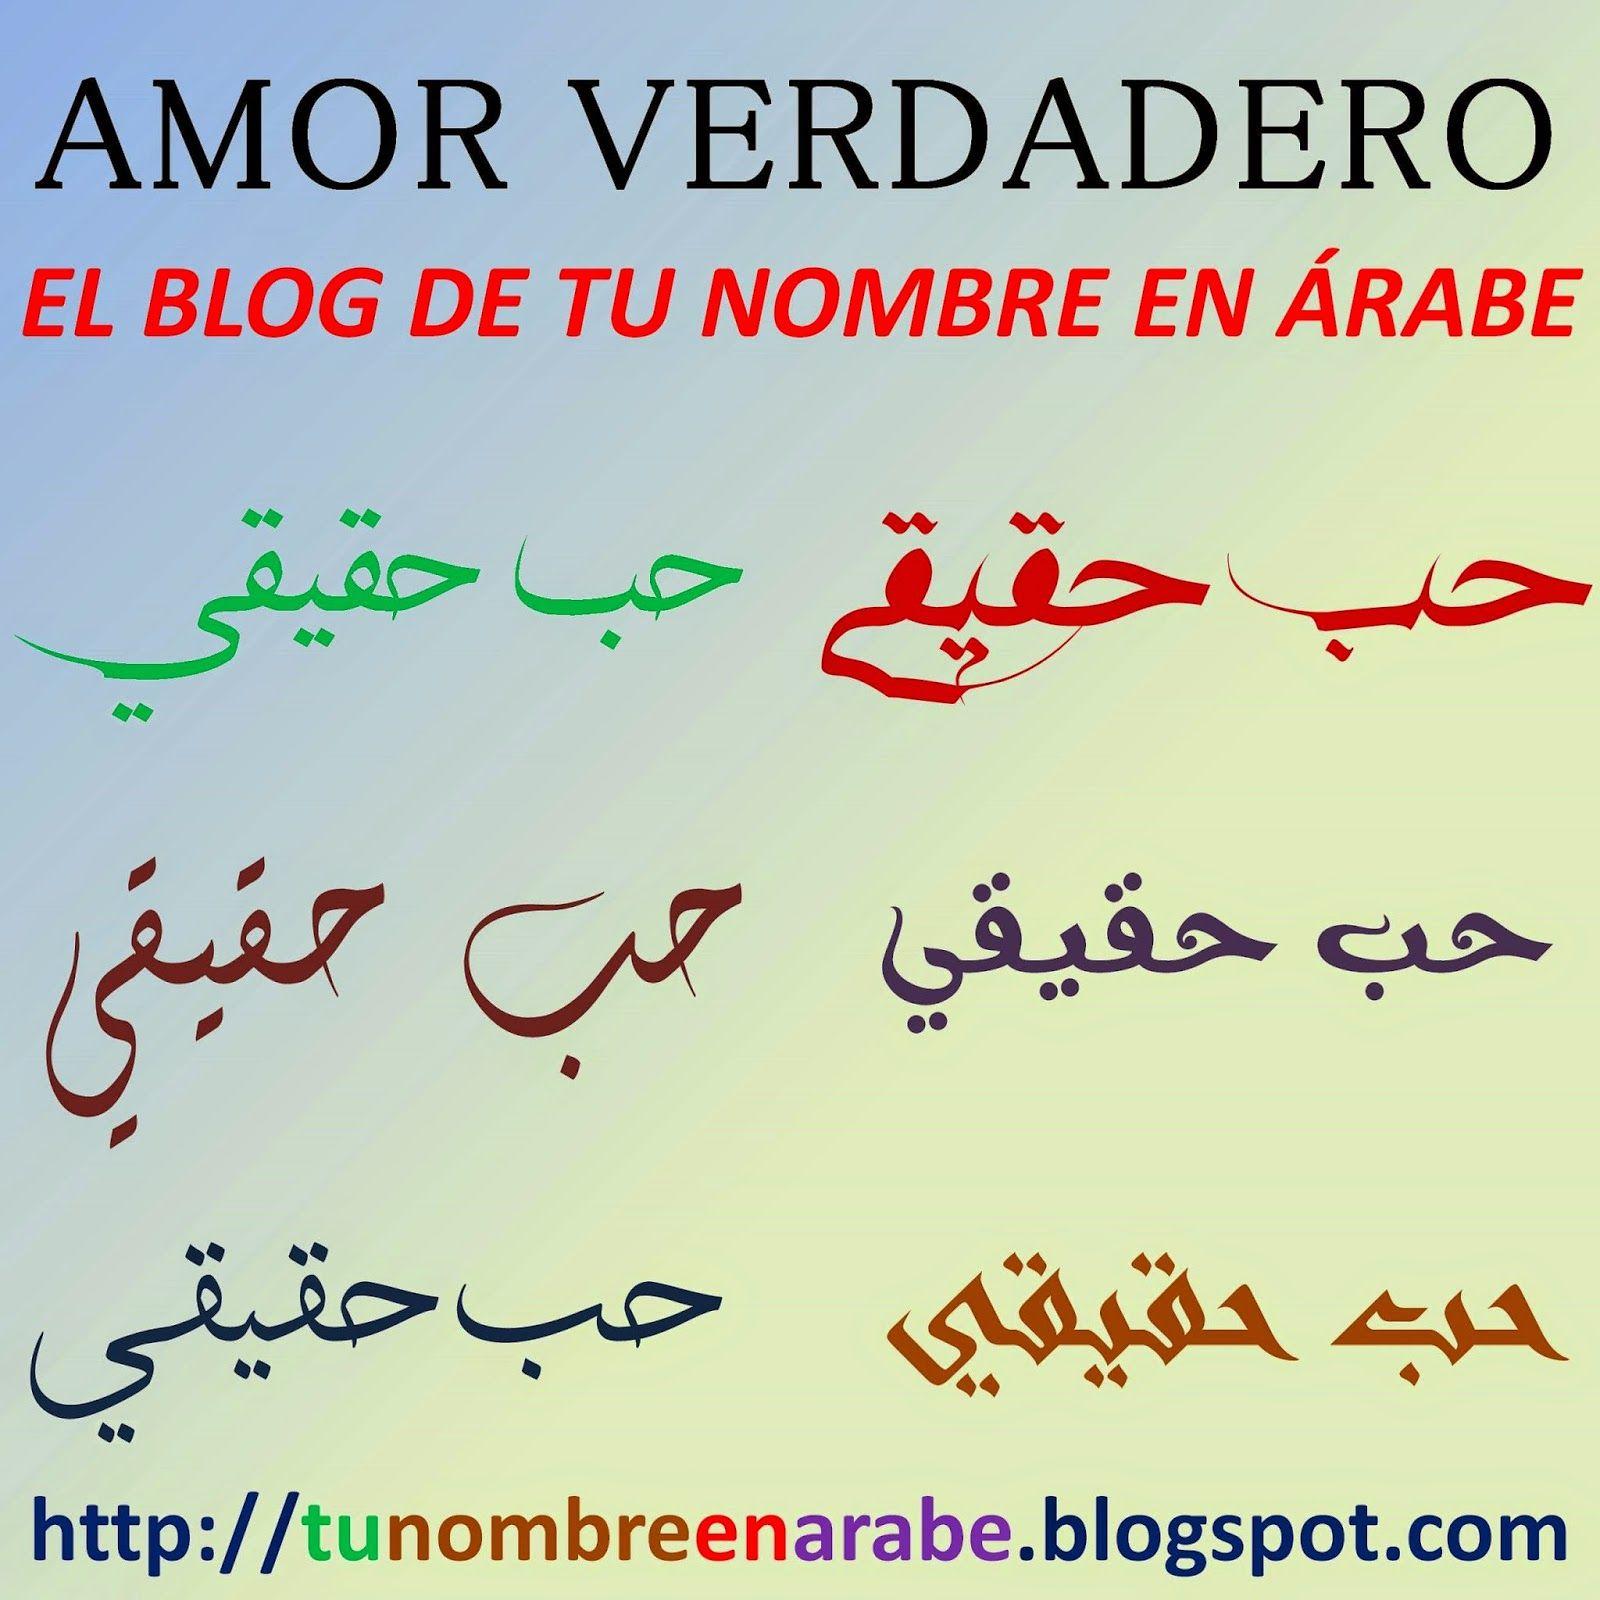 Amor Verdadero en arabe para tatuajes